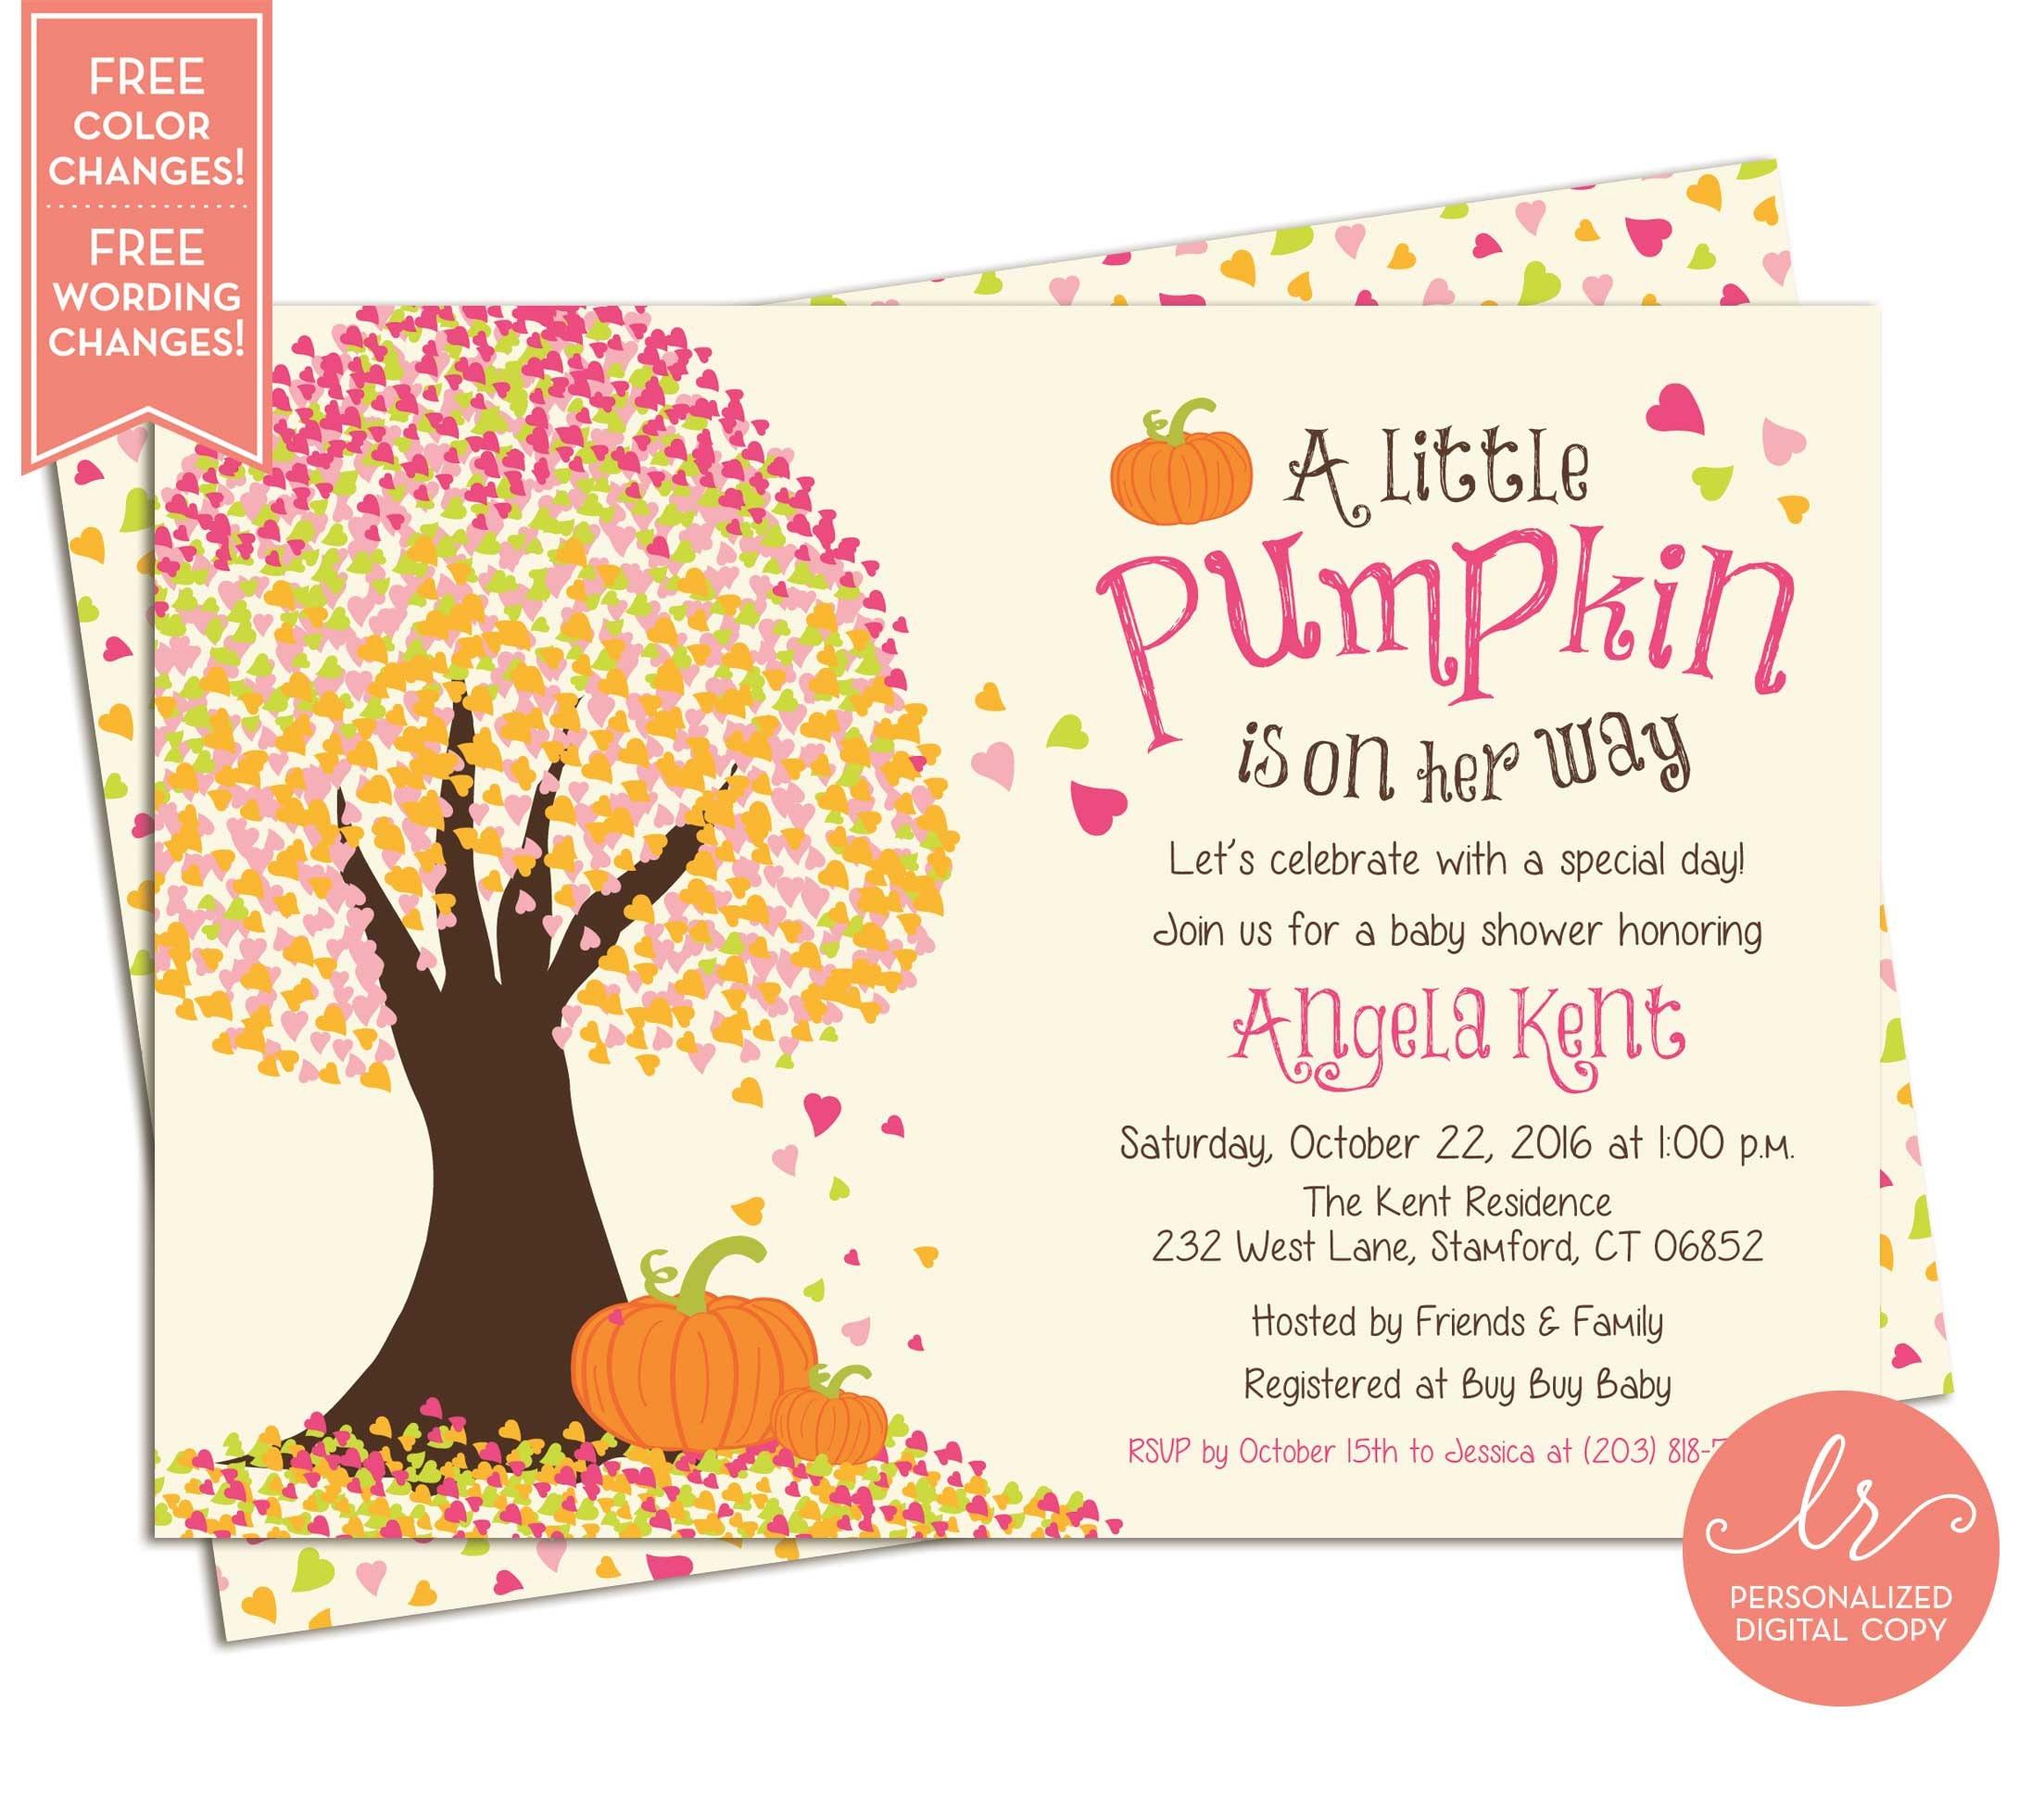 Little Pumpkin Baby Shower Invitations Fall Baby Shower